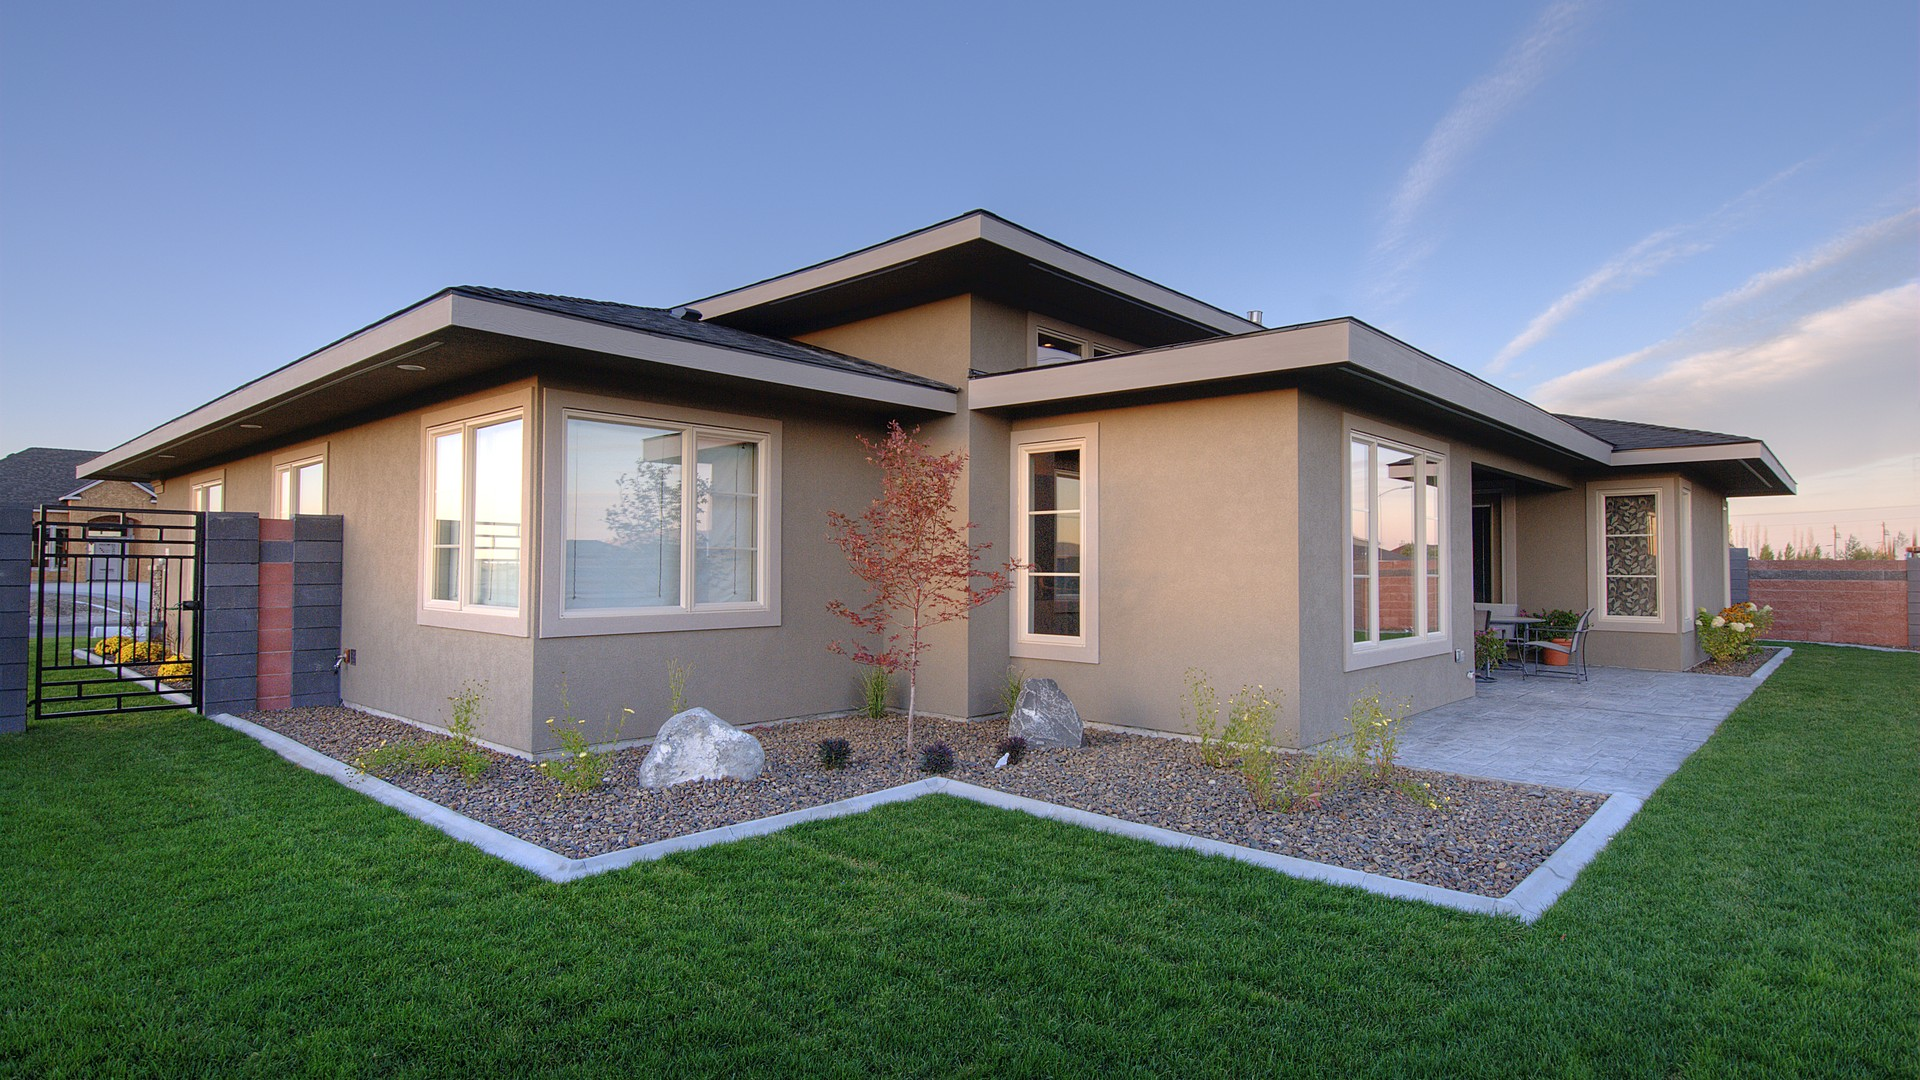 Contemporary House Plan 1245 The Riverside: 2334 Sqft, 4